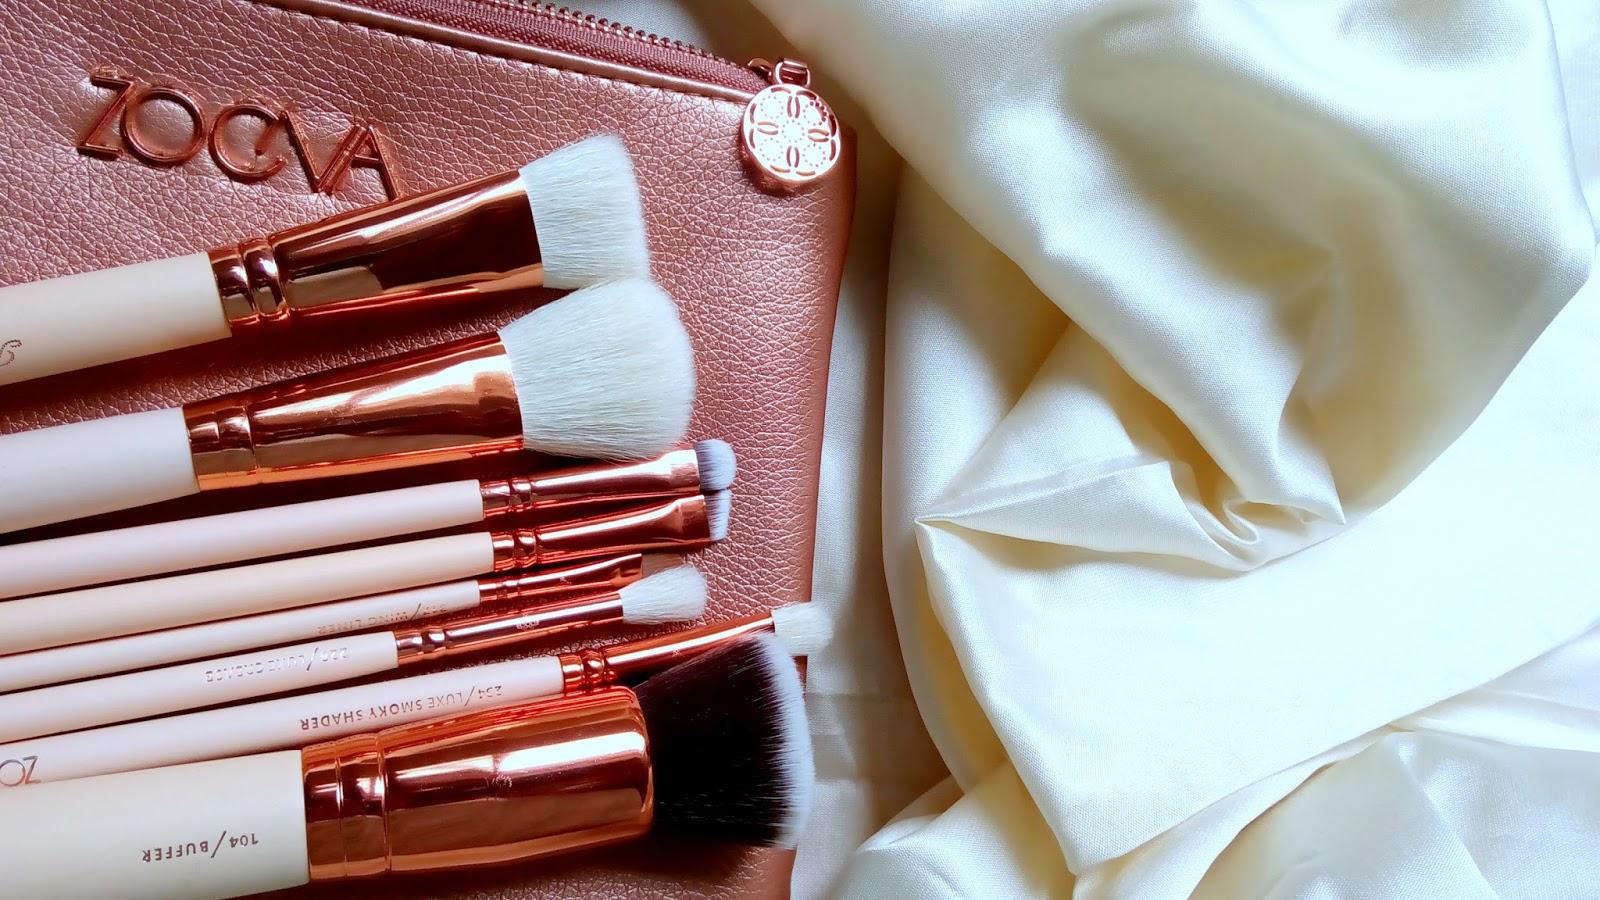 Review Of Zoeva Rose Gold Brush Set Dupe From Aliexpress Elegant Eves Dark Brown 8 Piece Bursh Bag Ali Express